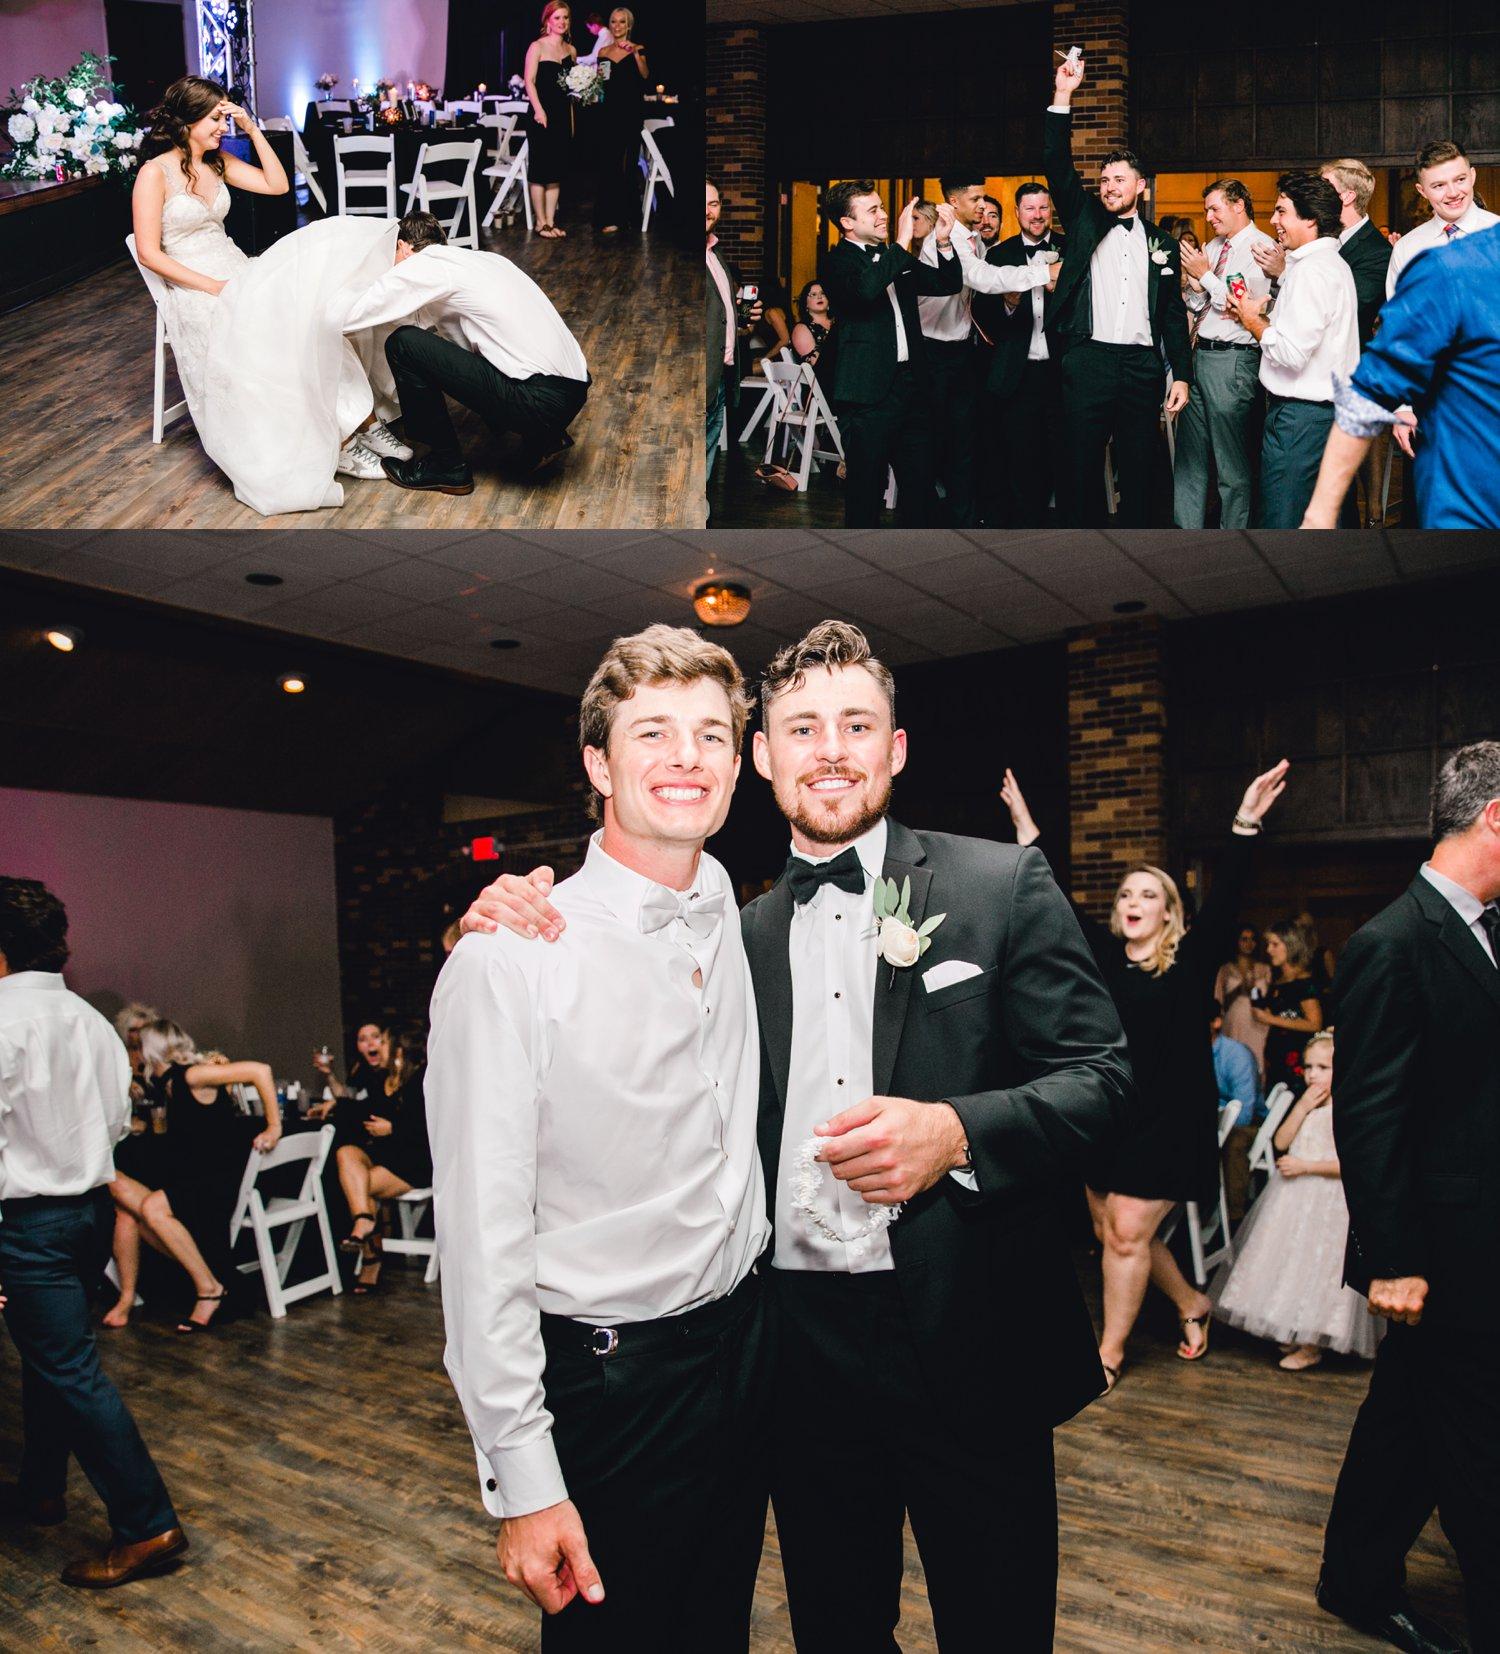 Hunter_and_Molly_Rawls_ALLEEJ_Lubbock_WEDDING_Legacy_Event_Center_0219.jpg